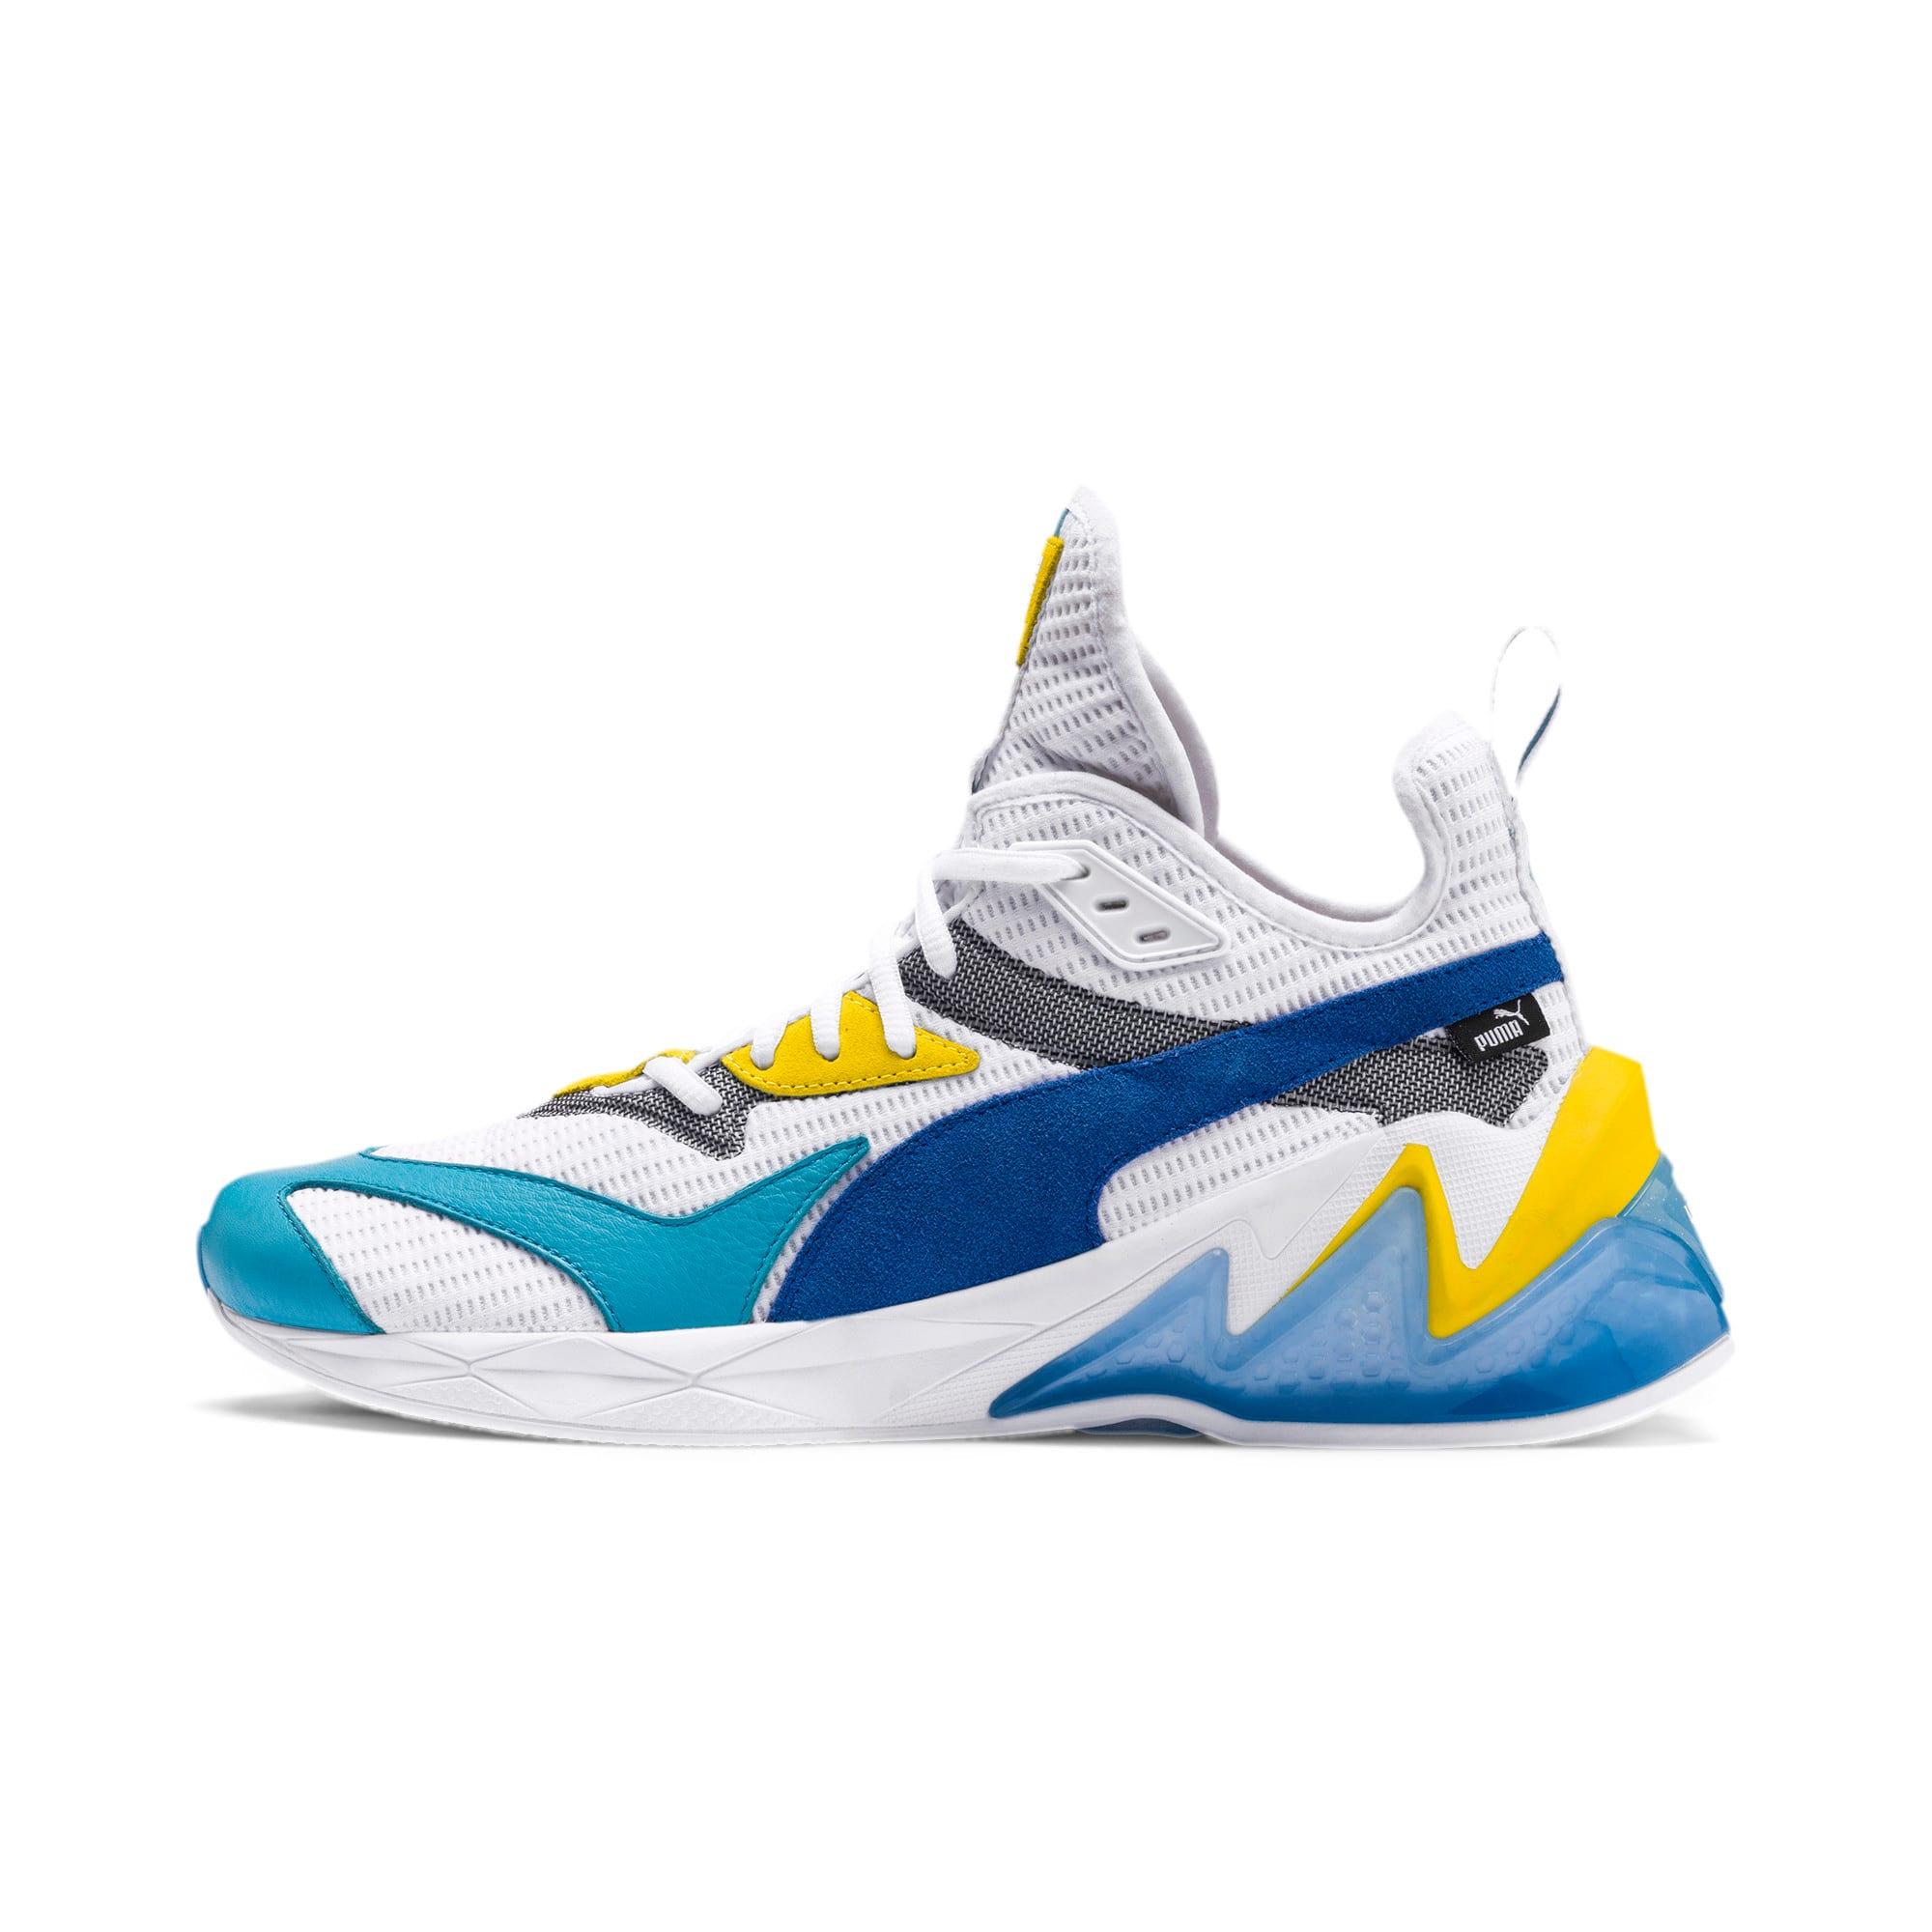 Thumbnail 1 of LQDCELL Origin Men's Shoes, Puma White-B Blue-Blz Yellow, medium